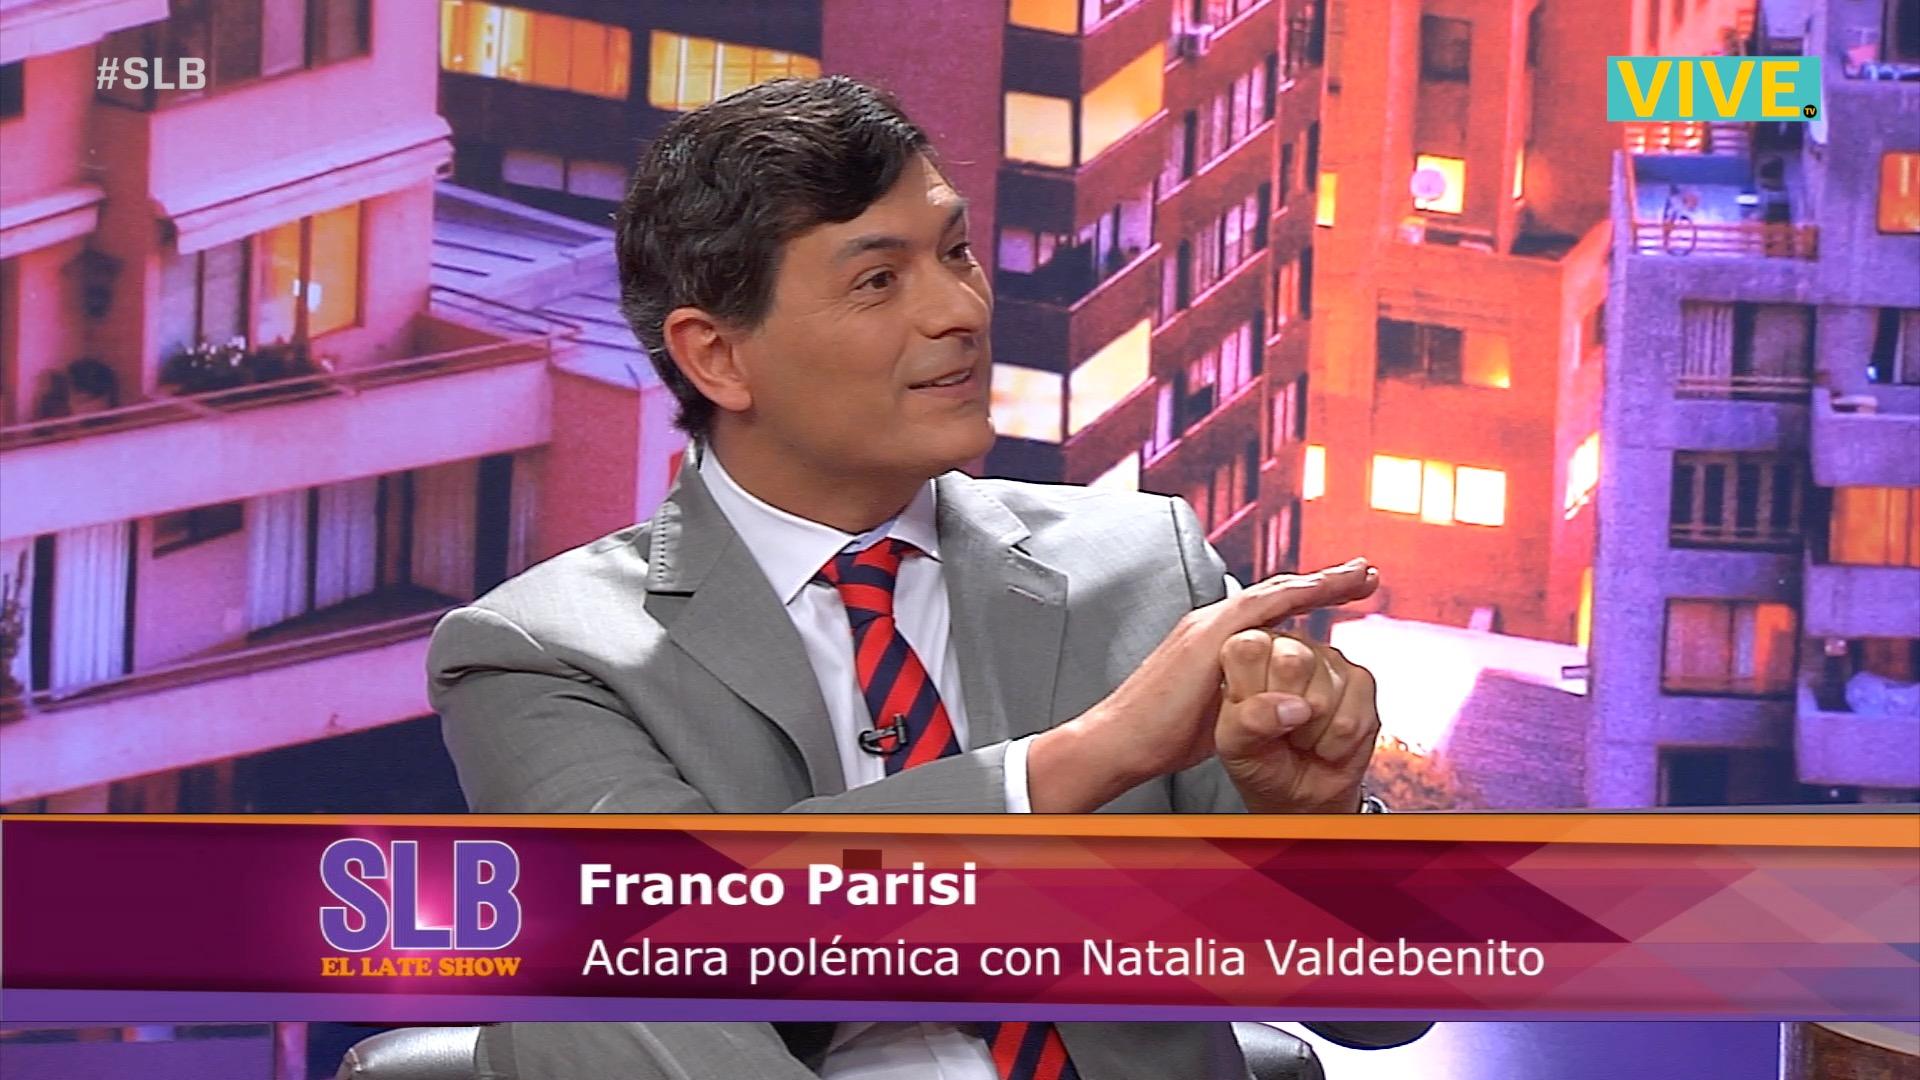 SLB. Franco Parisi le respondió a Natalia Valdebenito